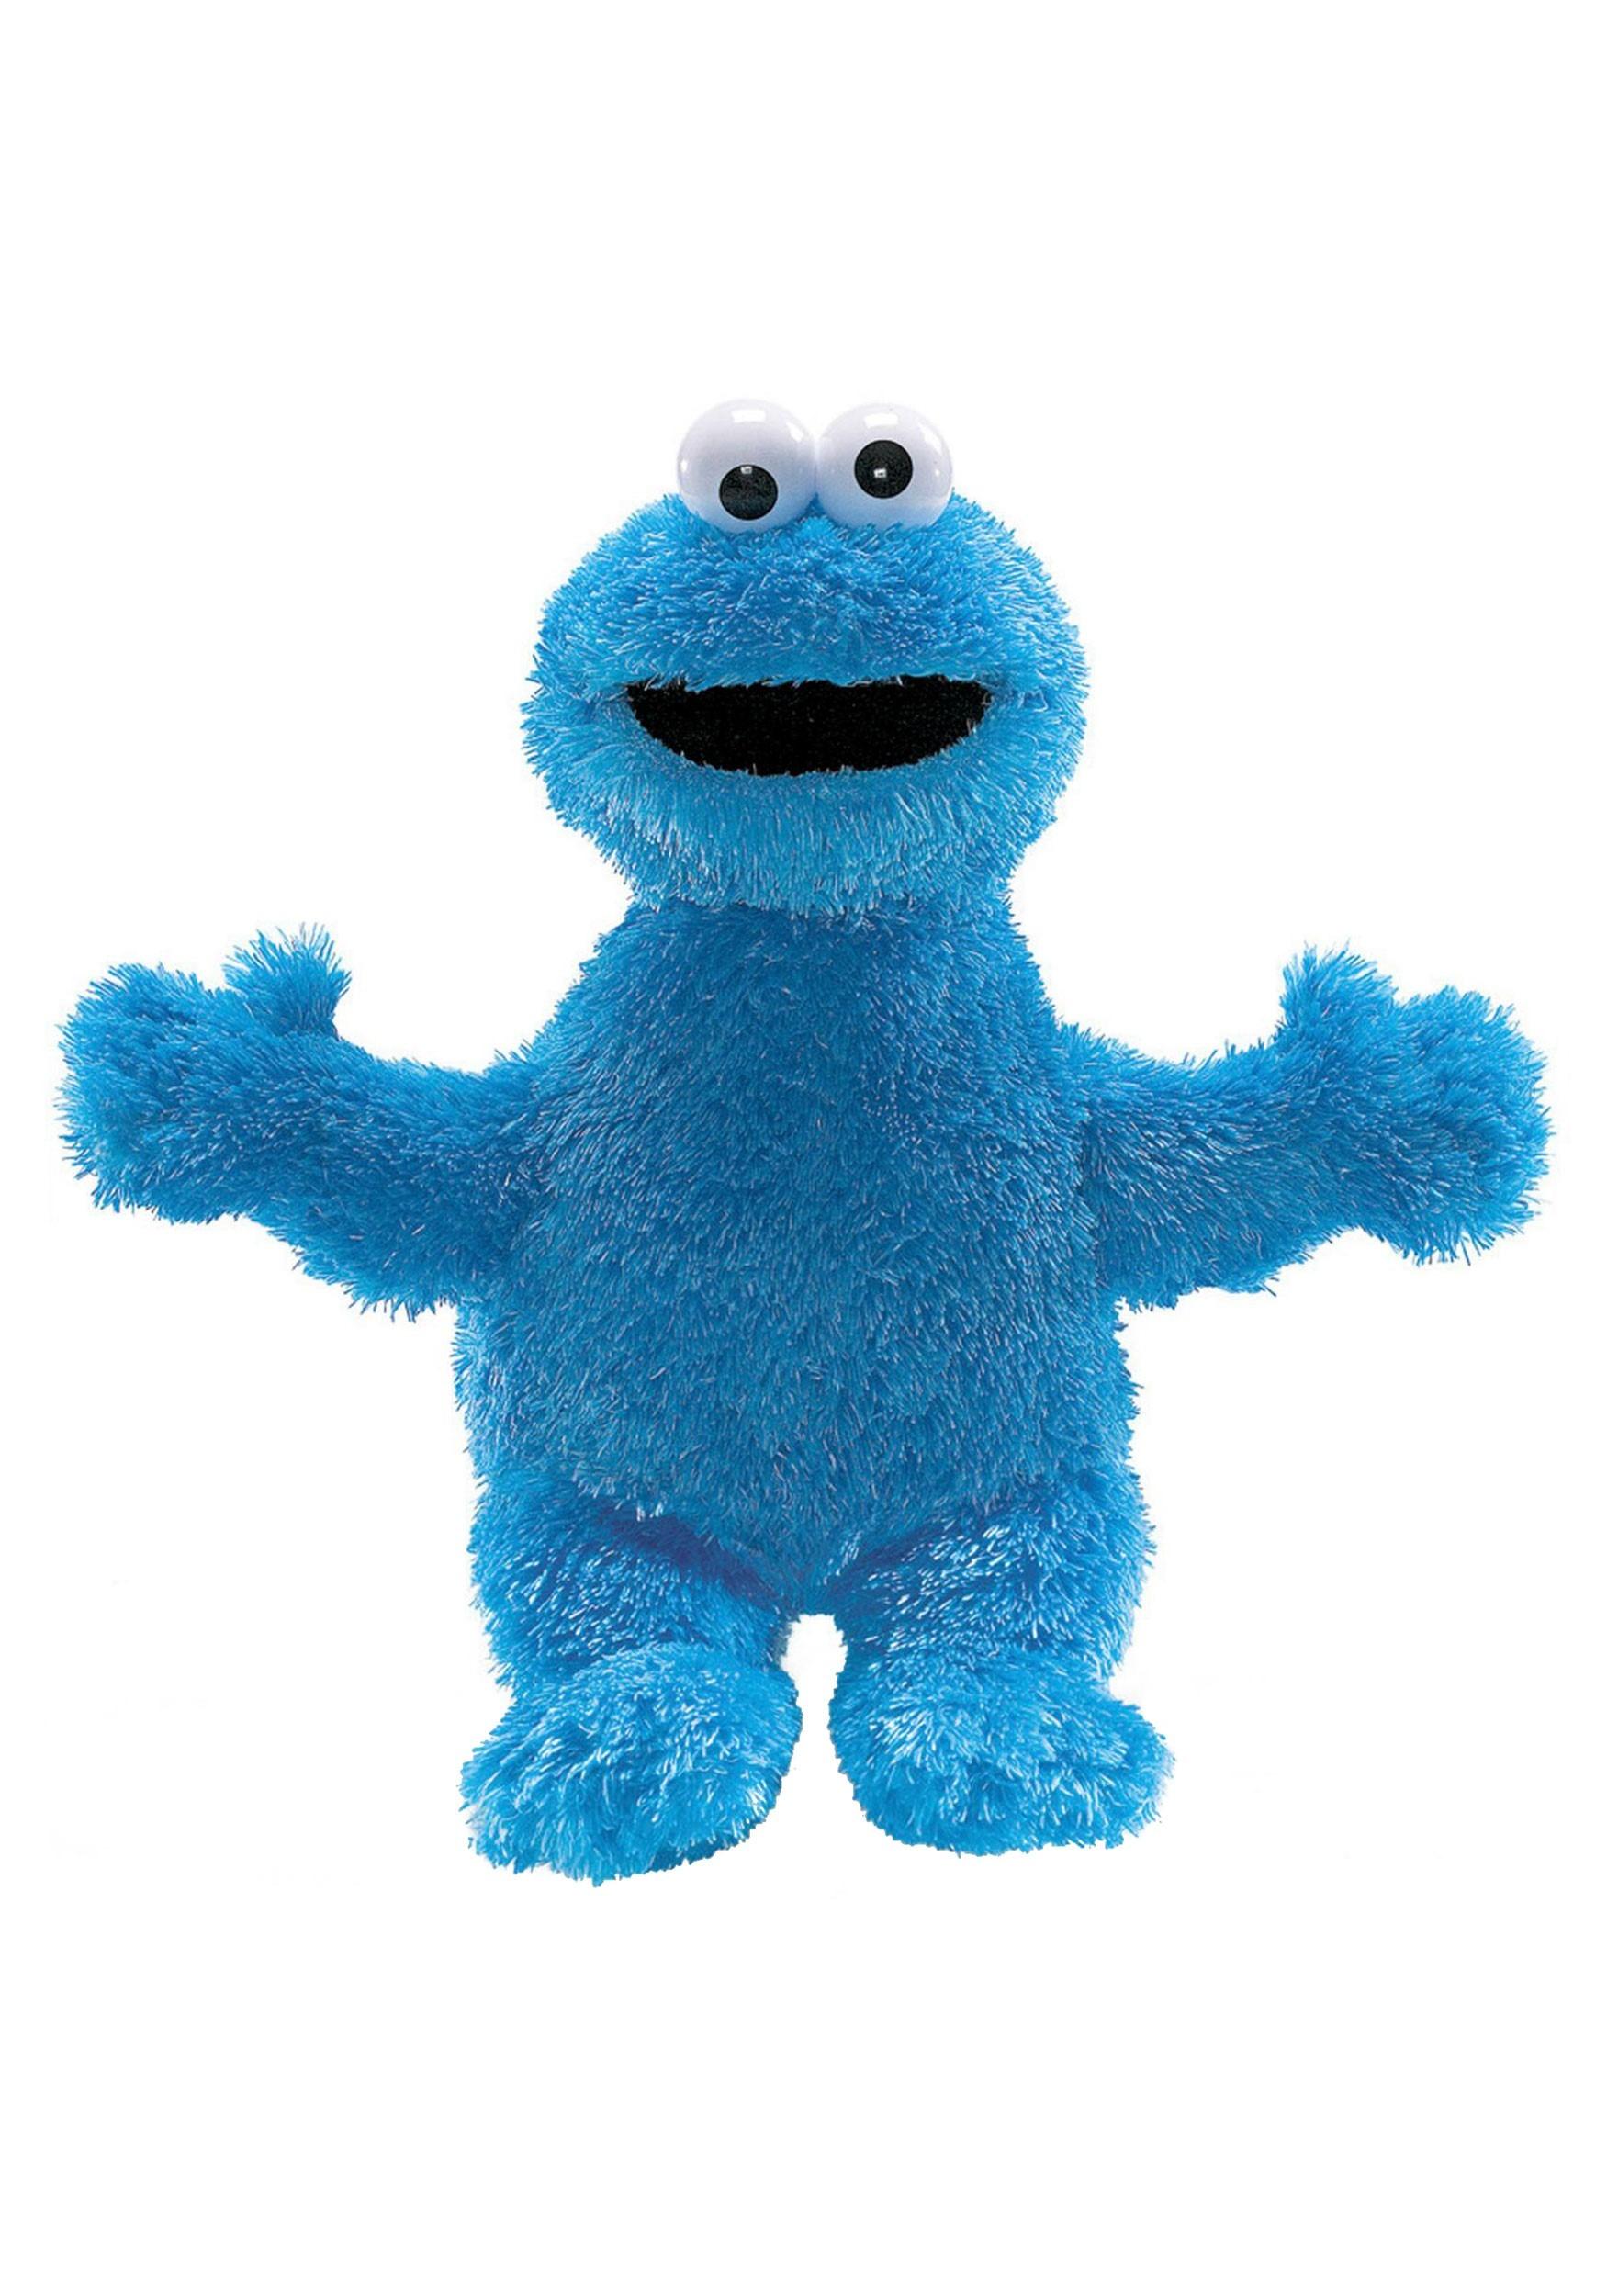 Stuffed Figure Cookie Monster